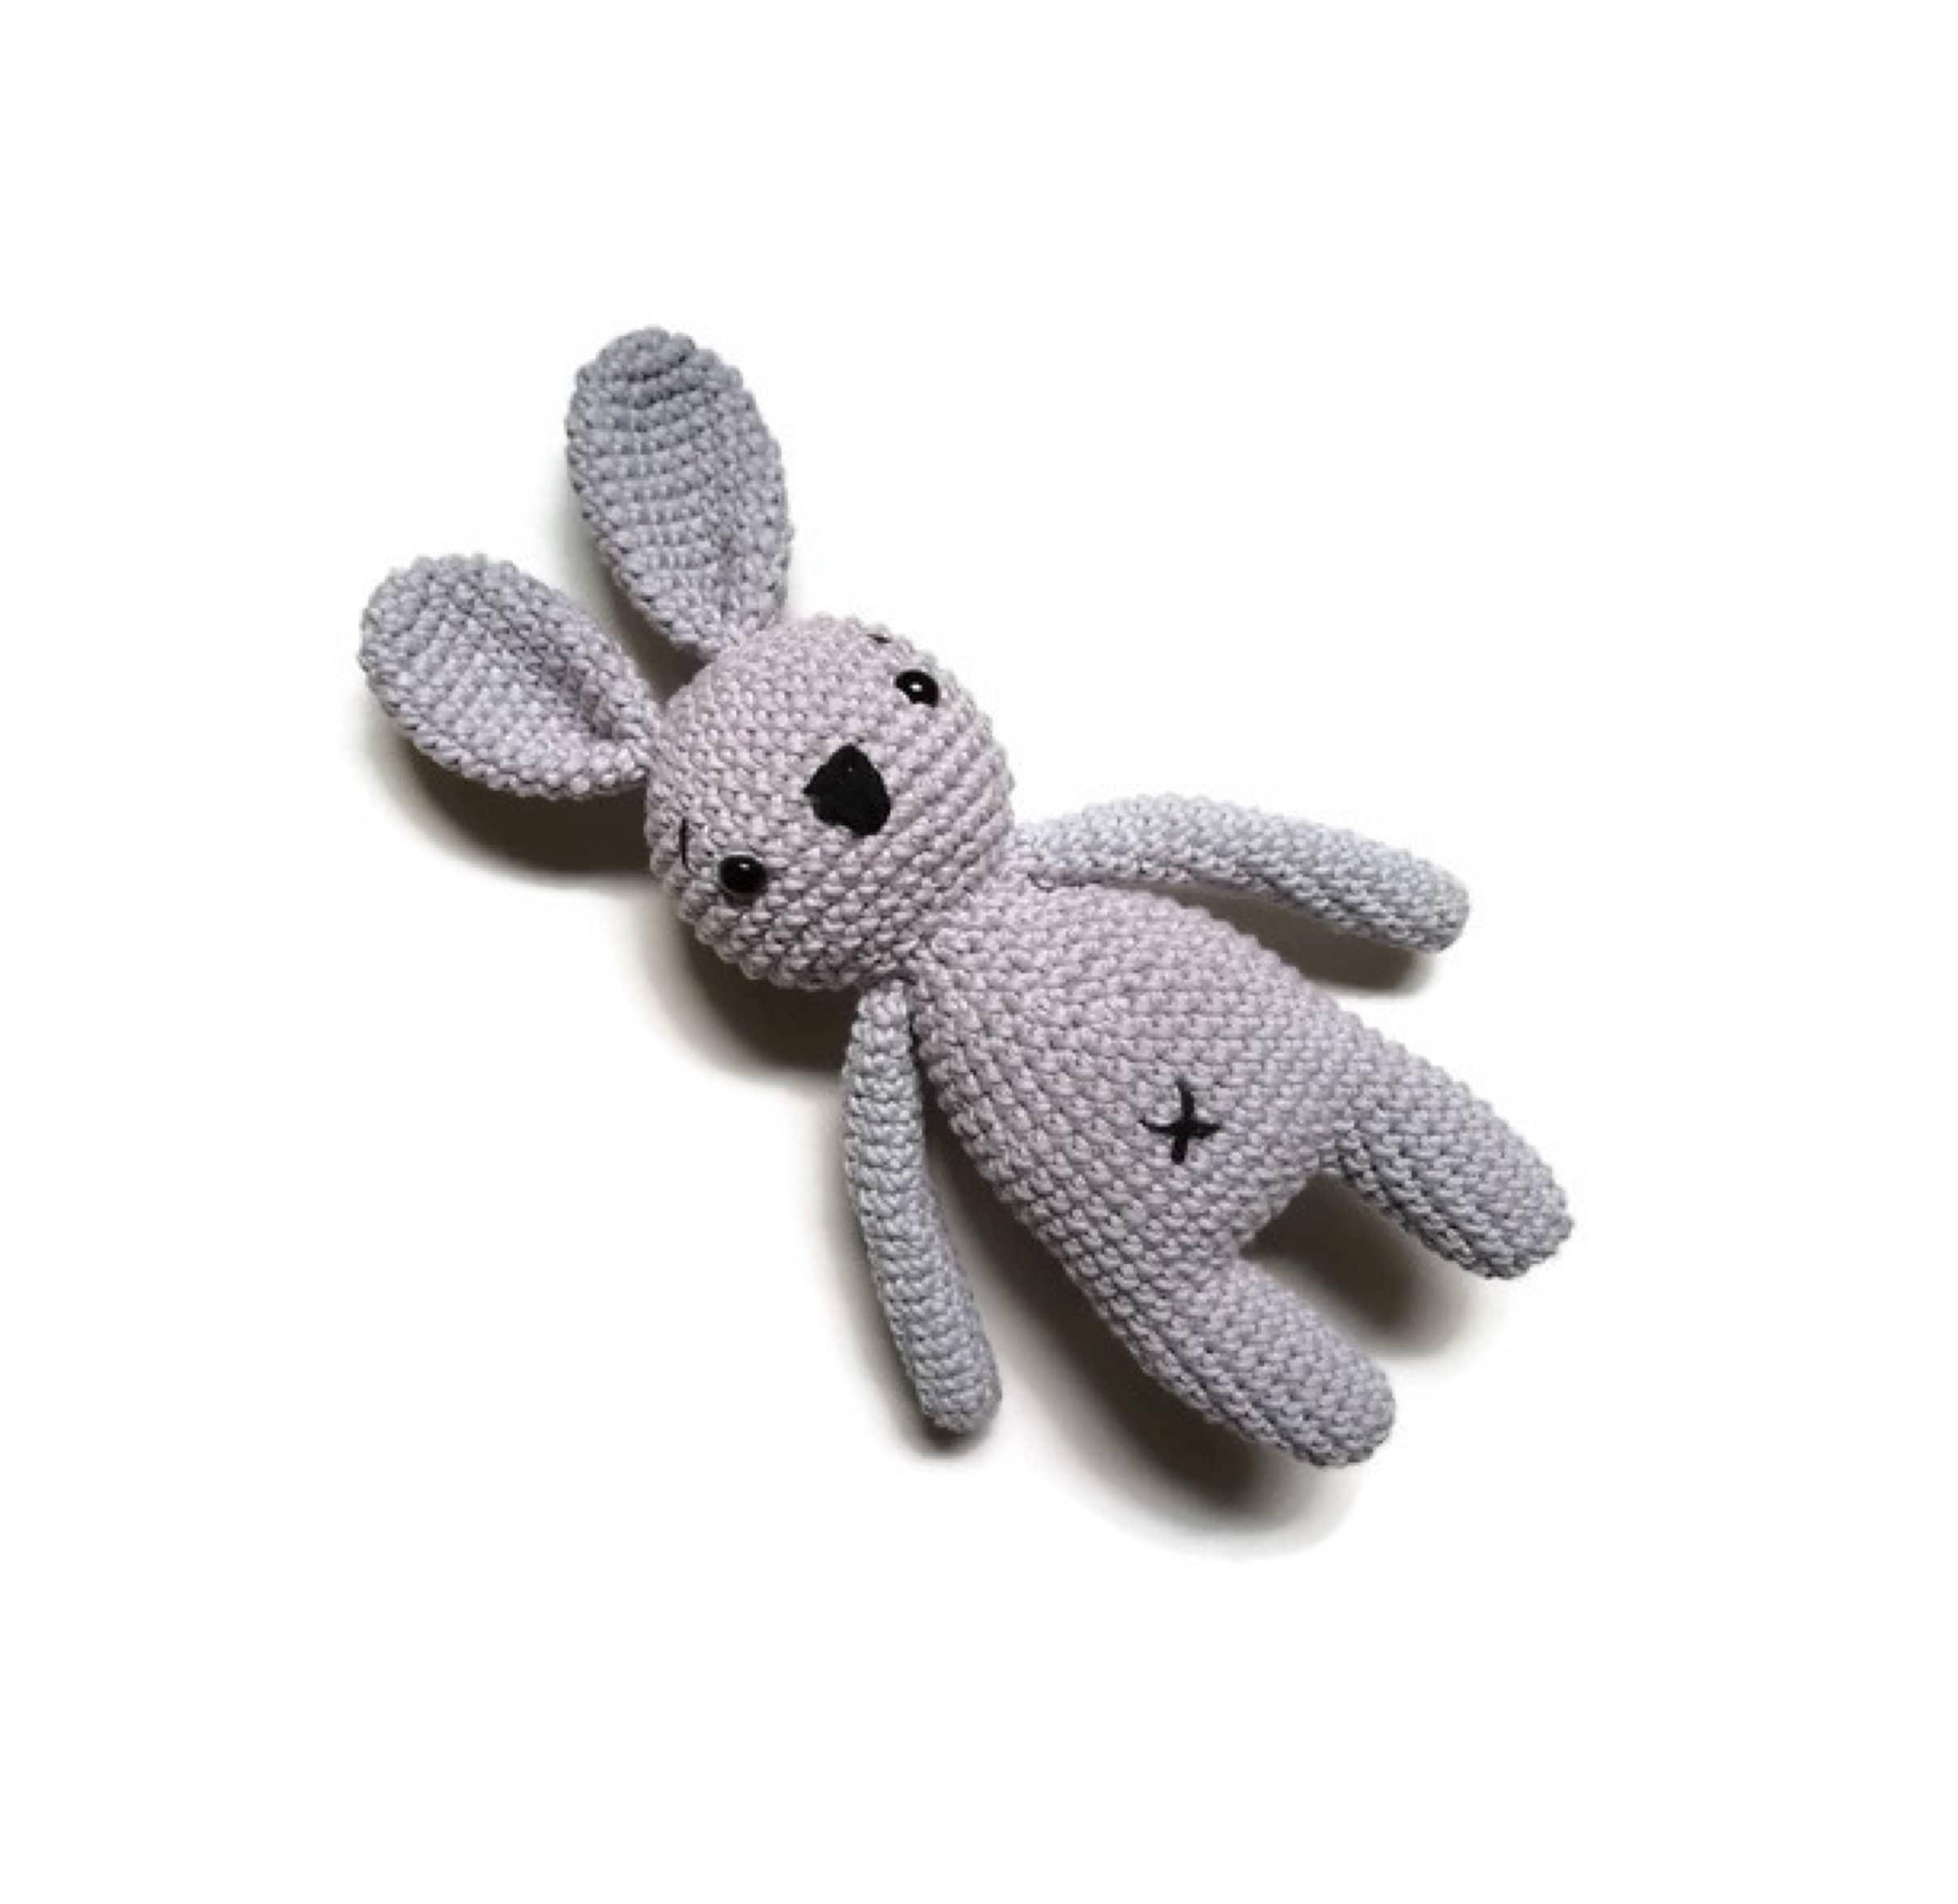 A508-3 Easter Bunny Plush Toy Amigurumi Bunny Rabit Toys Crochet ... | 2350x2417